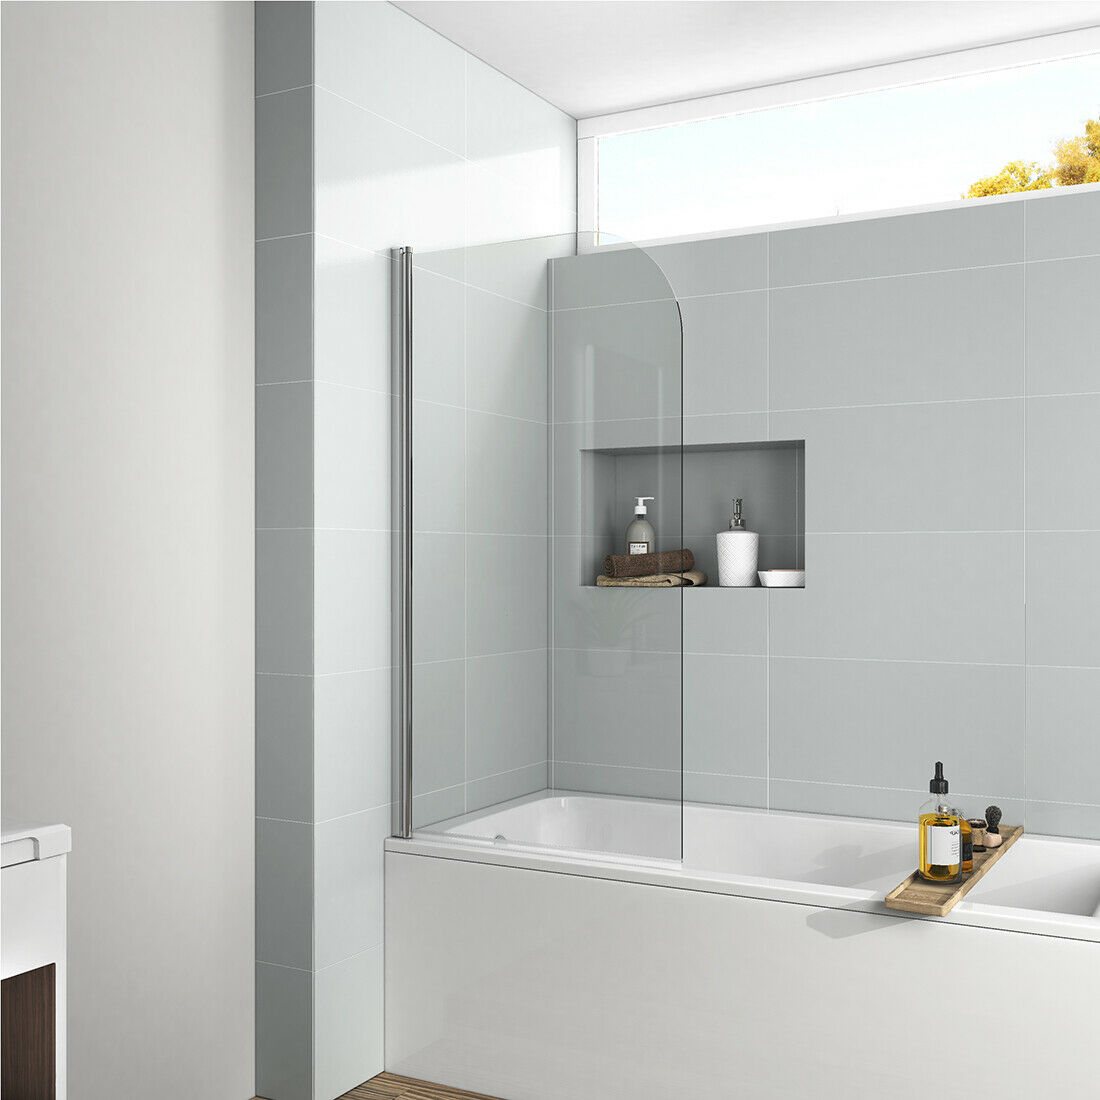 55 X30 Bathtub Shower Door Screen Hinged Frameless 1 4 Clear Glass Chrome